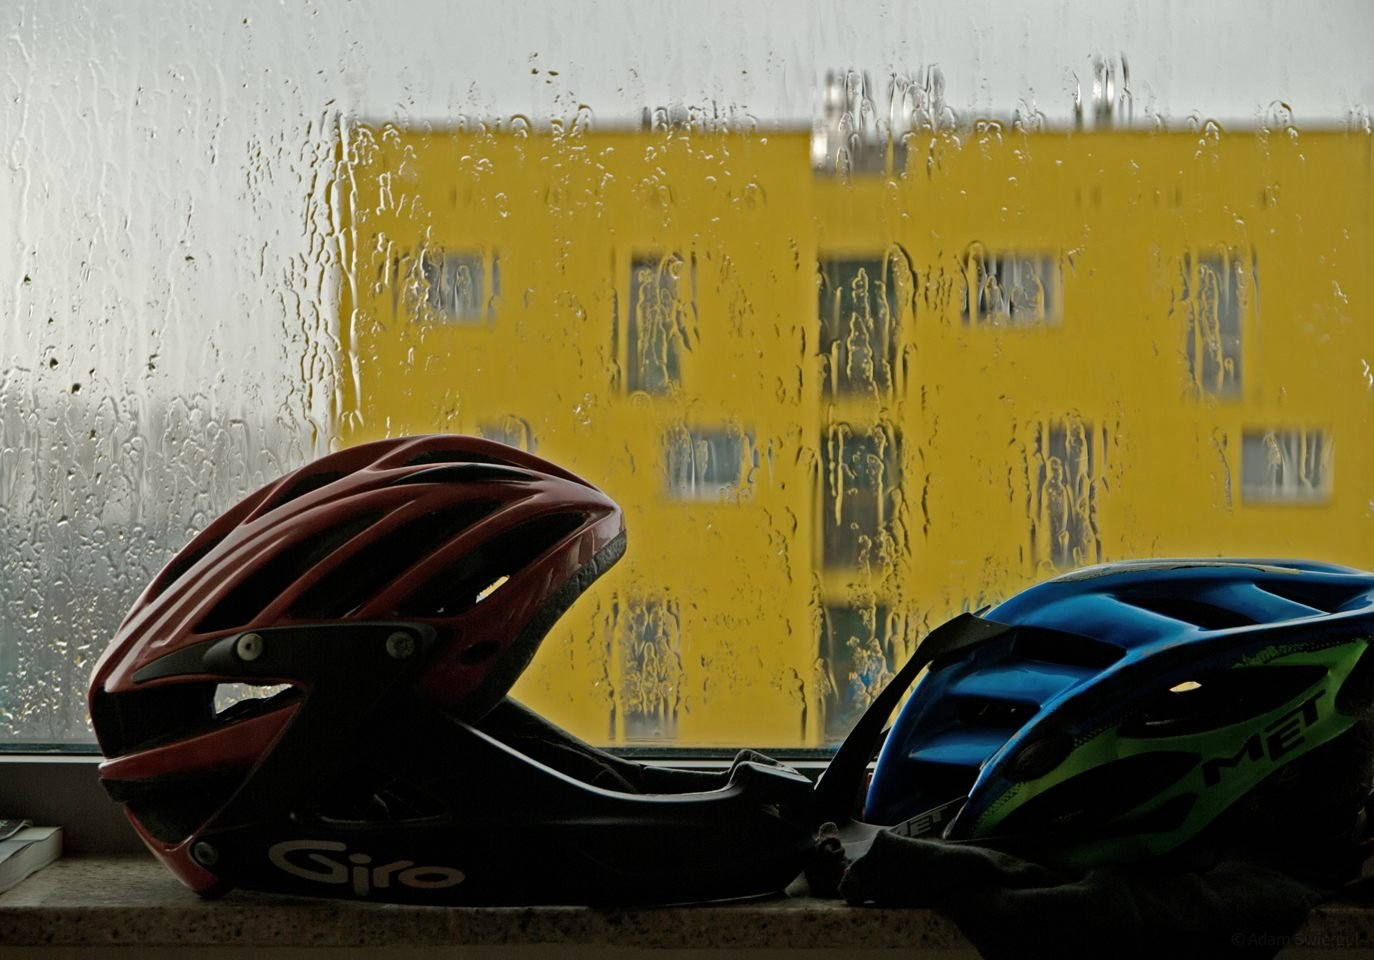 Kaski i deszcz